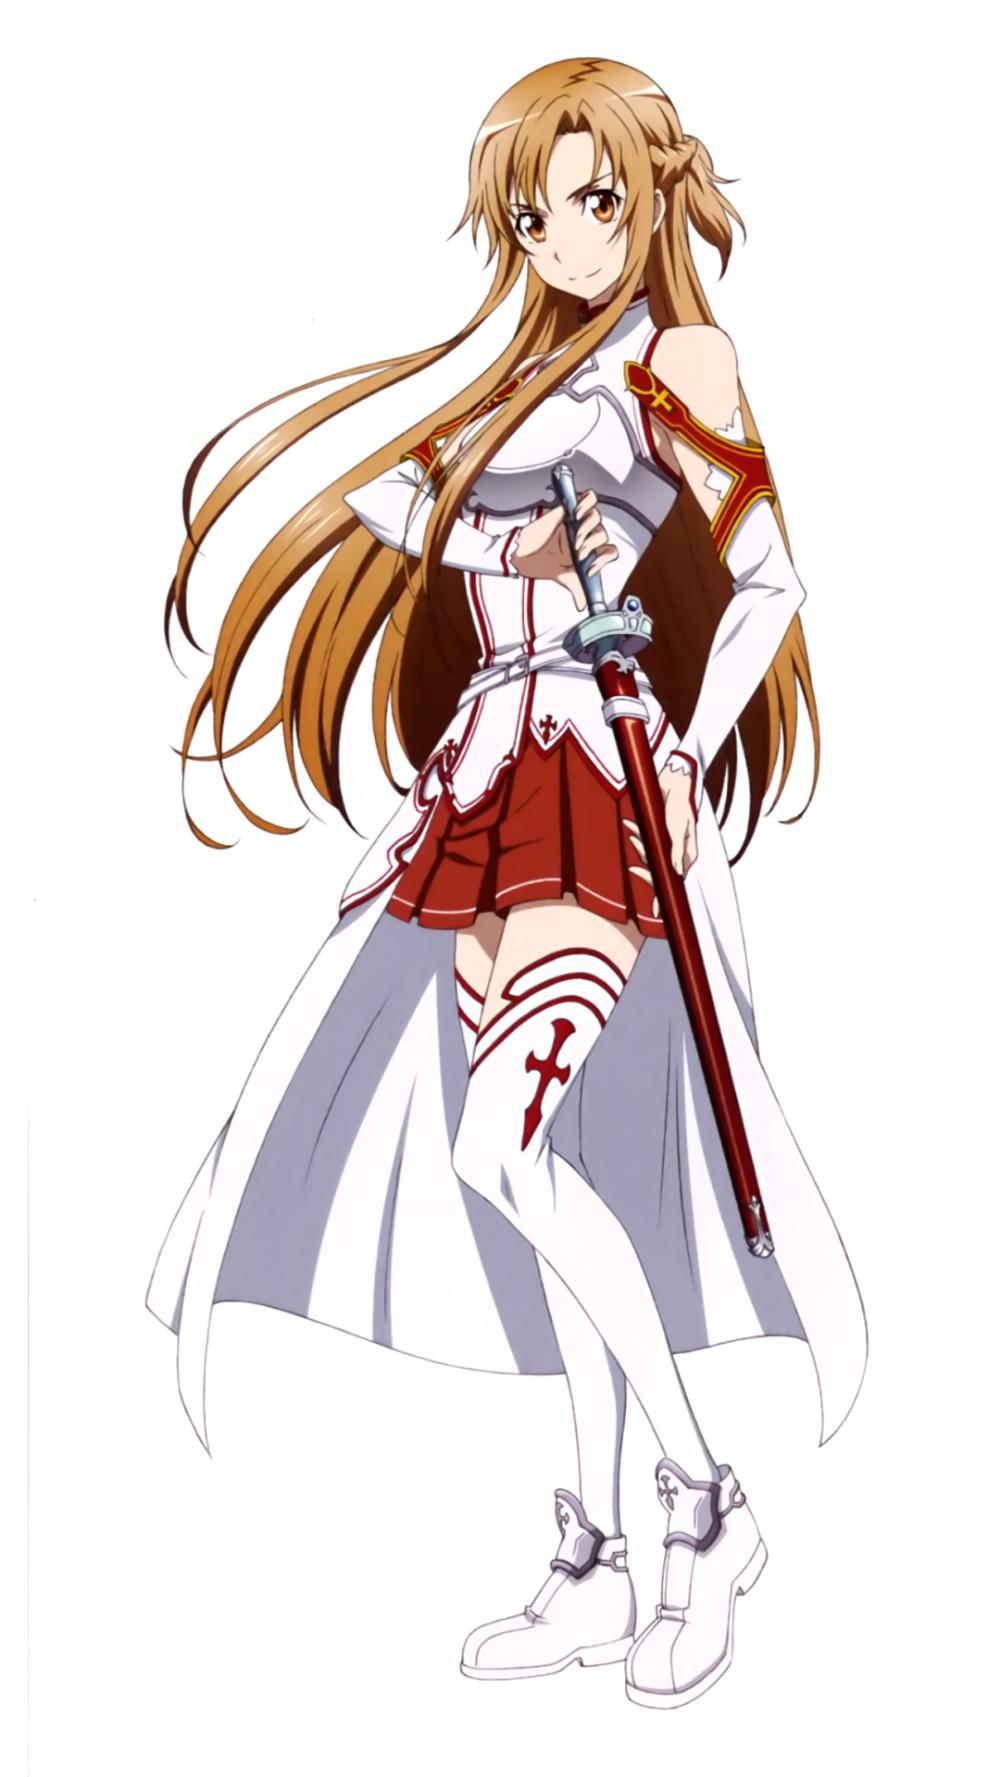 Asuna Yuuki Anime Sword Art Online 10801920 Mobile Wallpaper In 2020 Sword Art Online Asuna Sword Art Online Wallpaper Sword Art